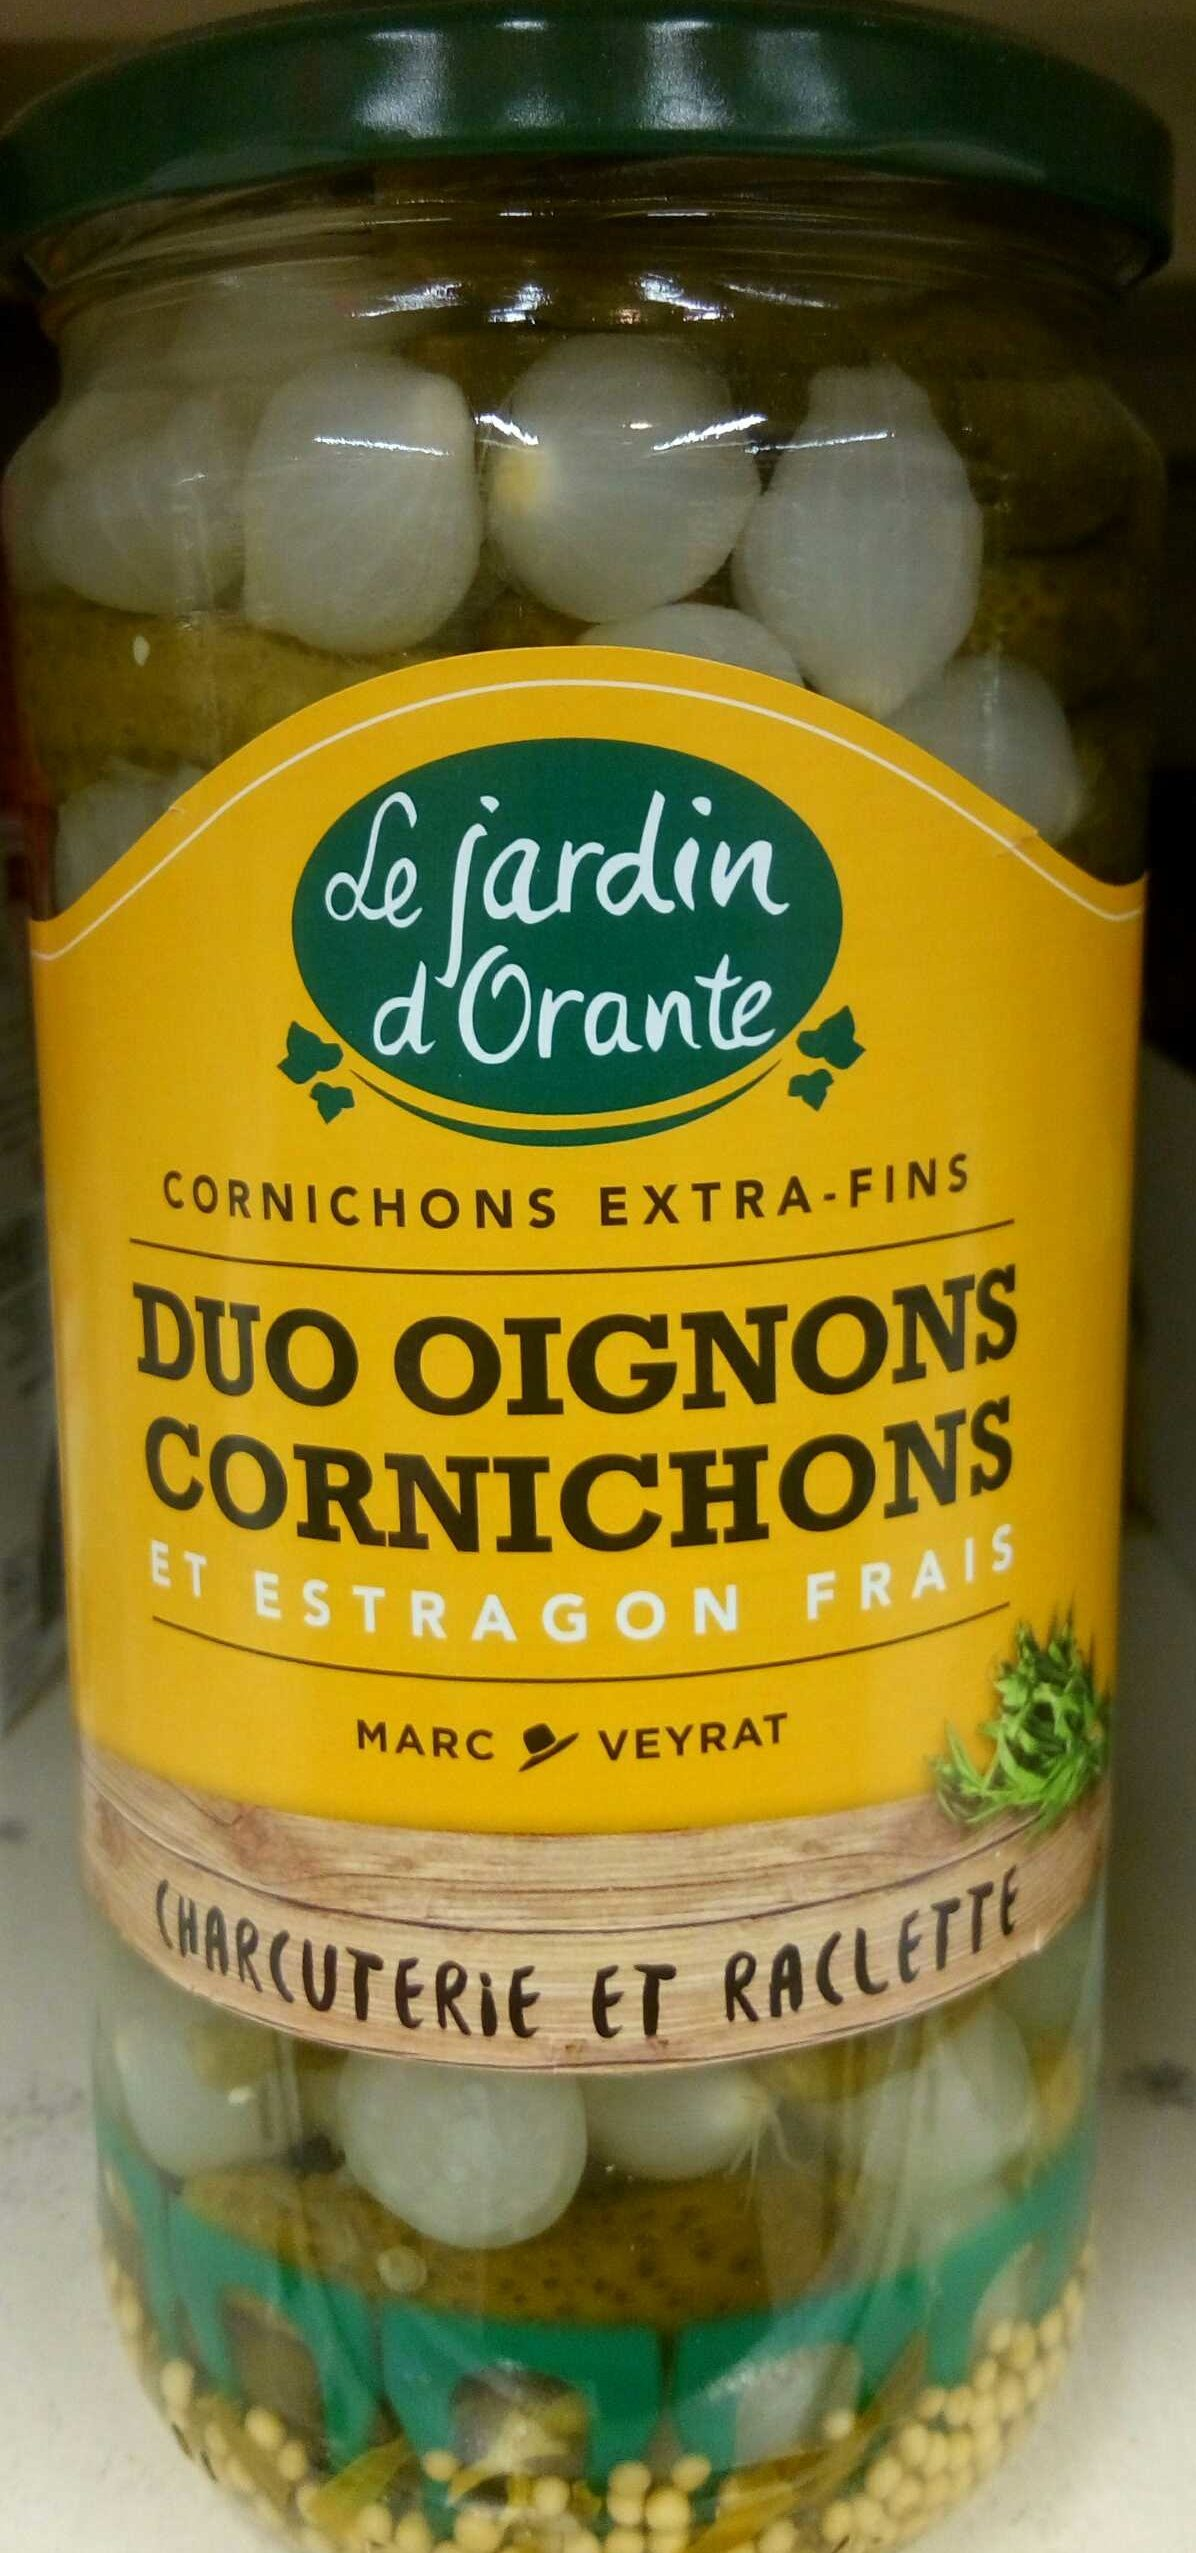 Duo oignons et cornichons - Product